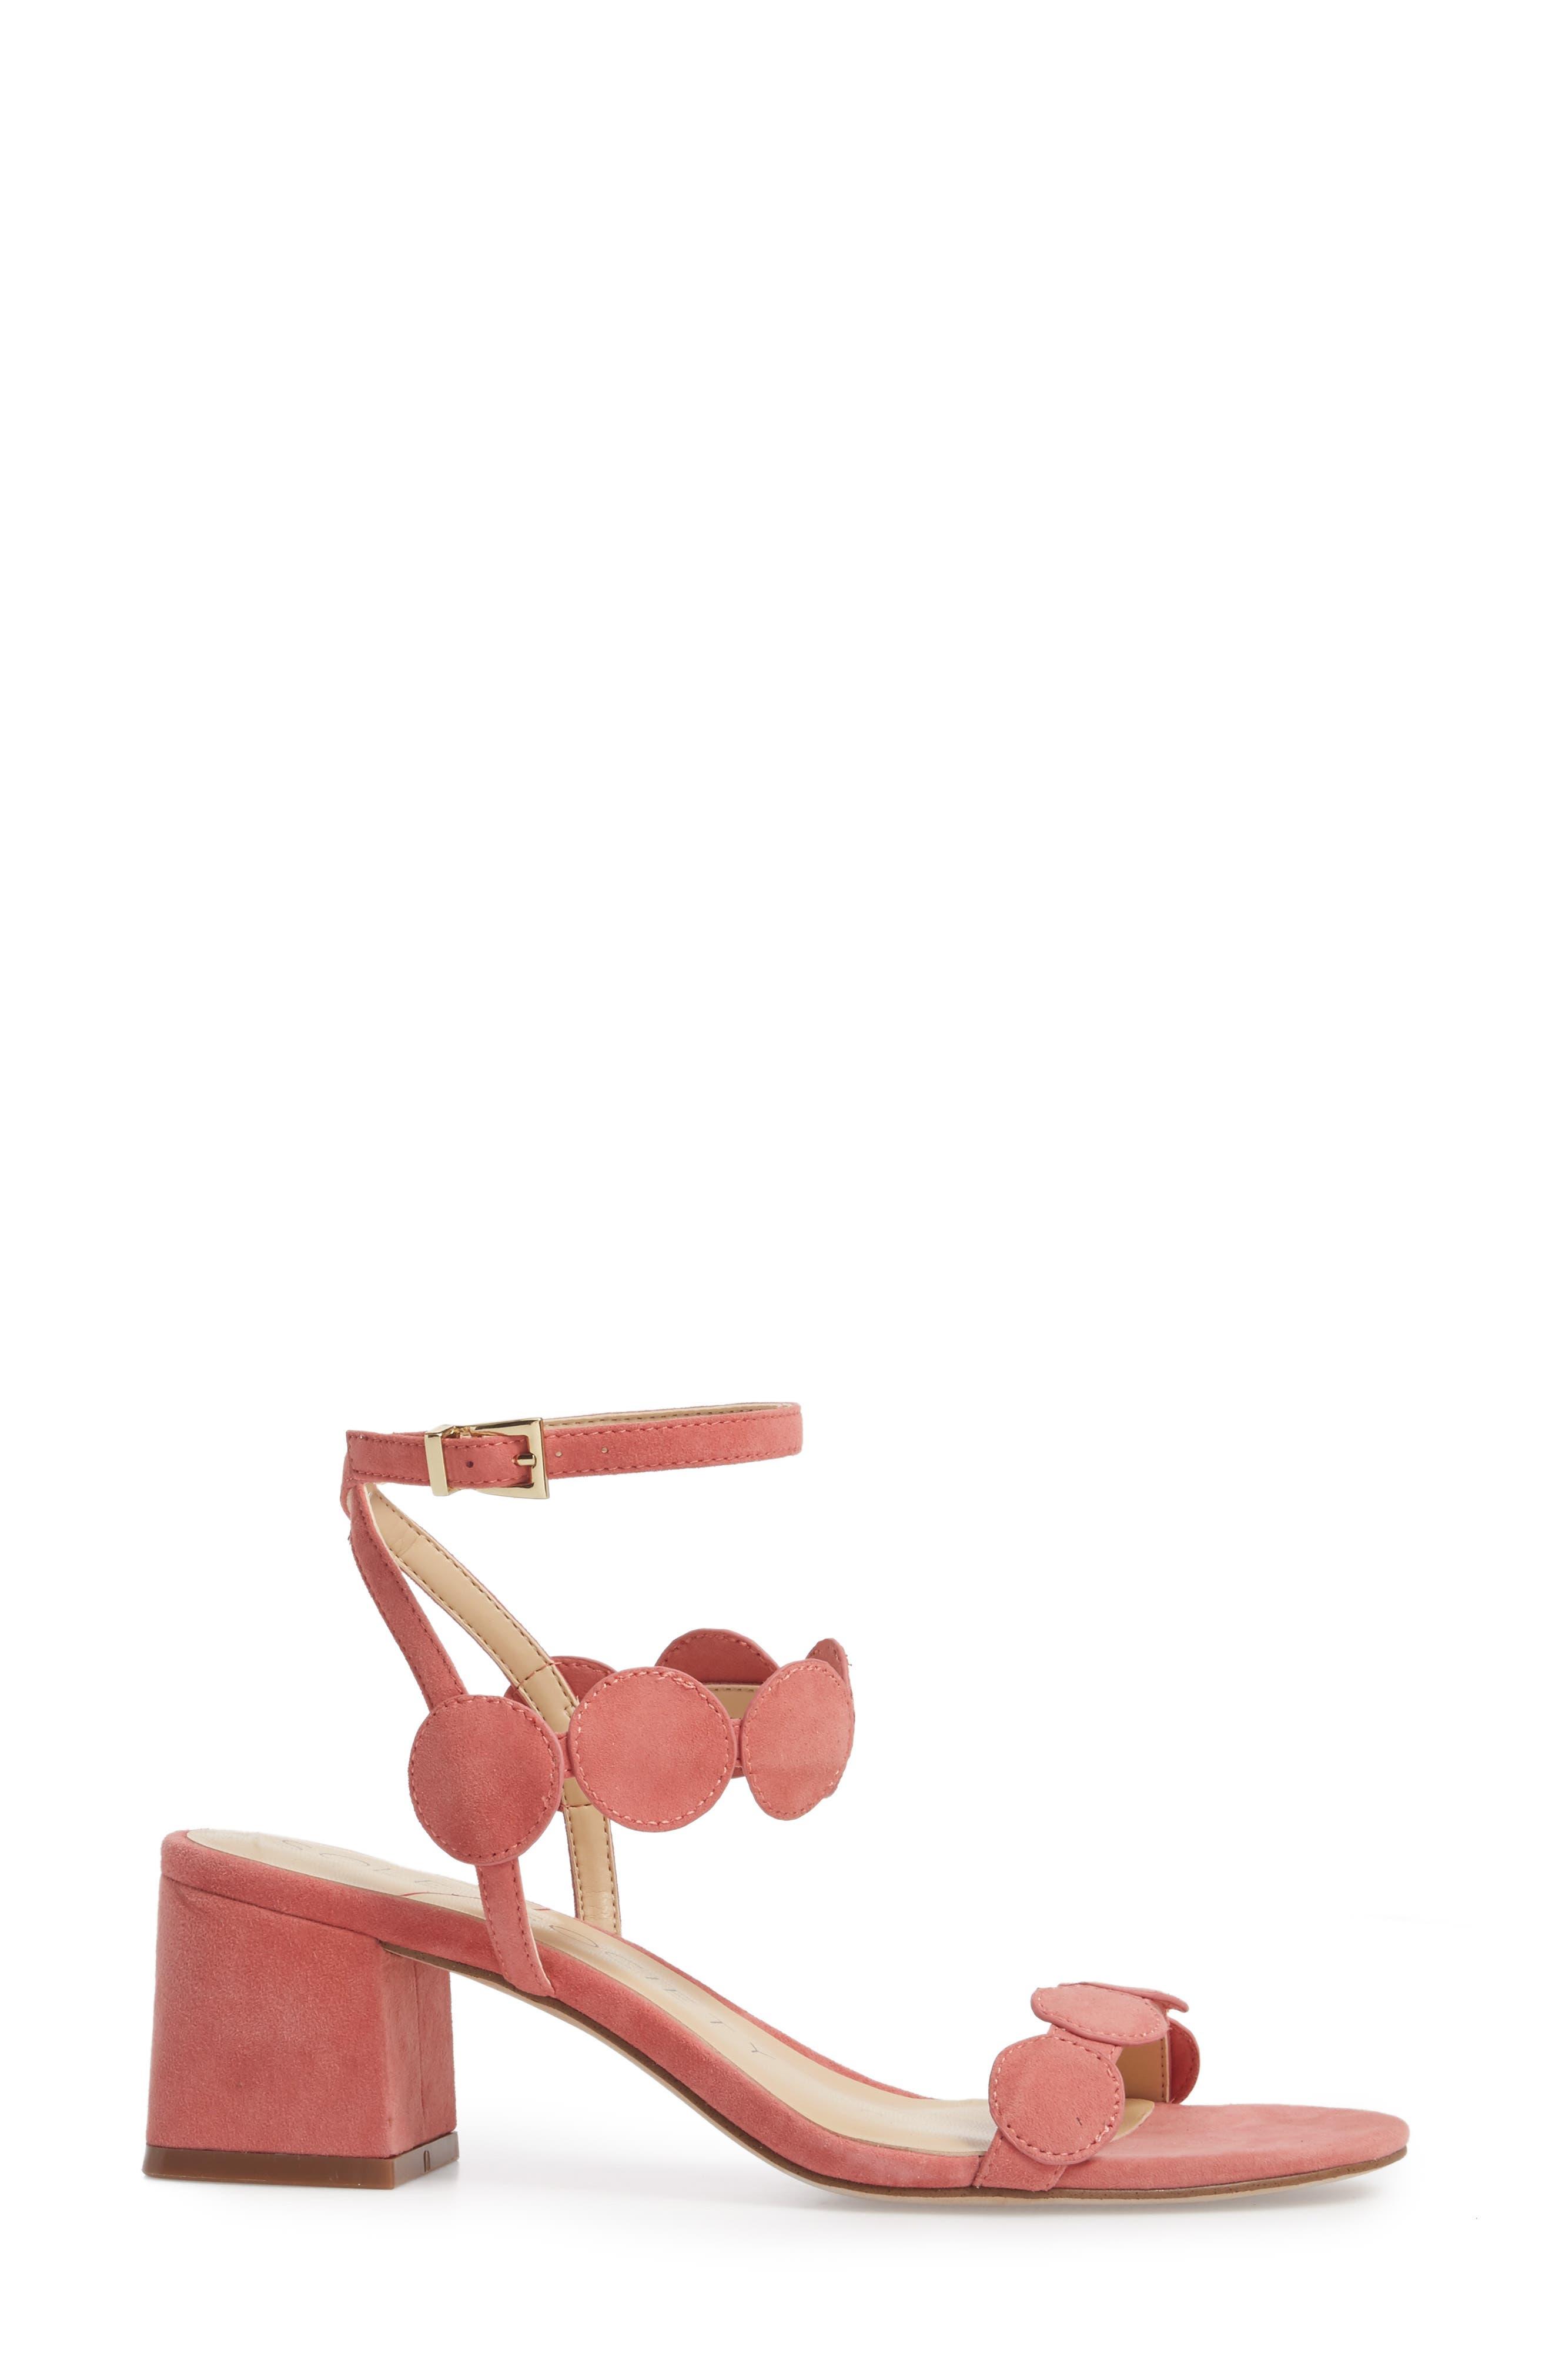 Shea Block Heel Sandal,                             Alternate thumbnail 17, color,